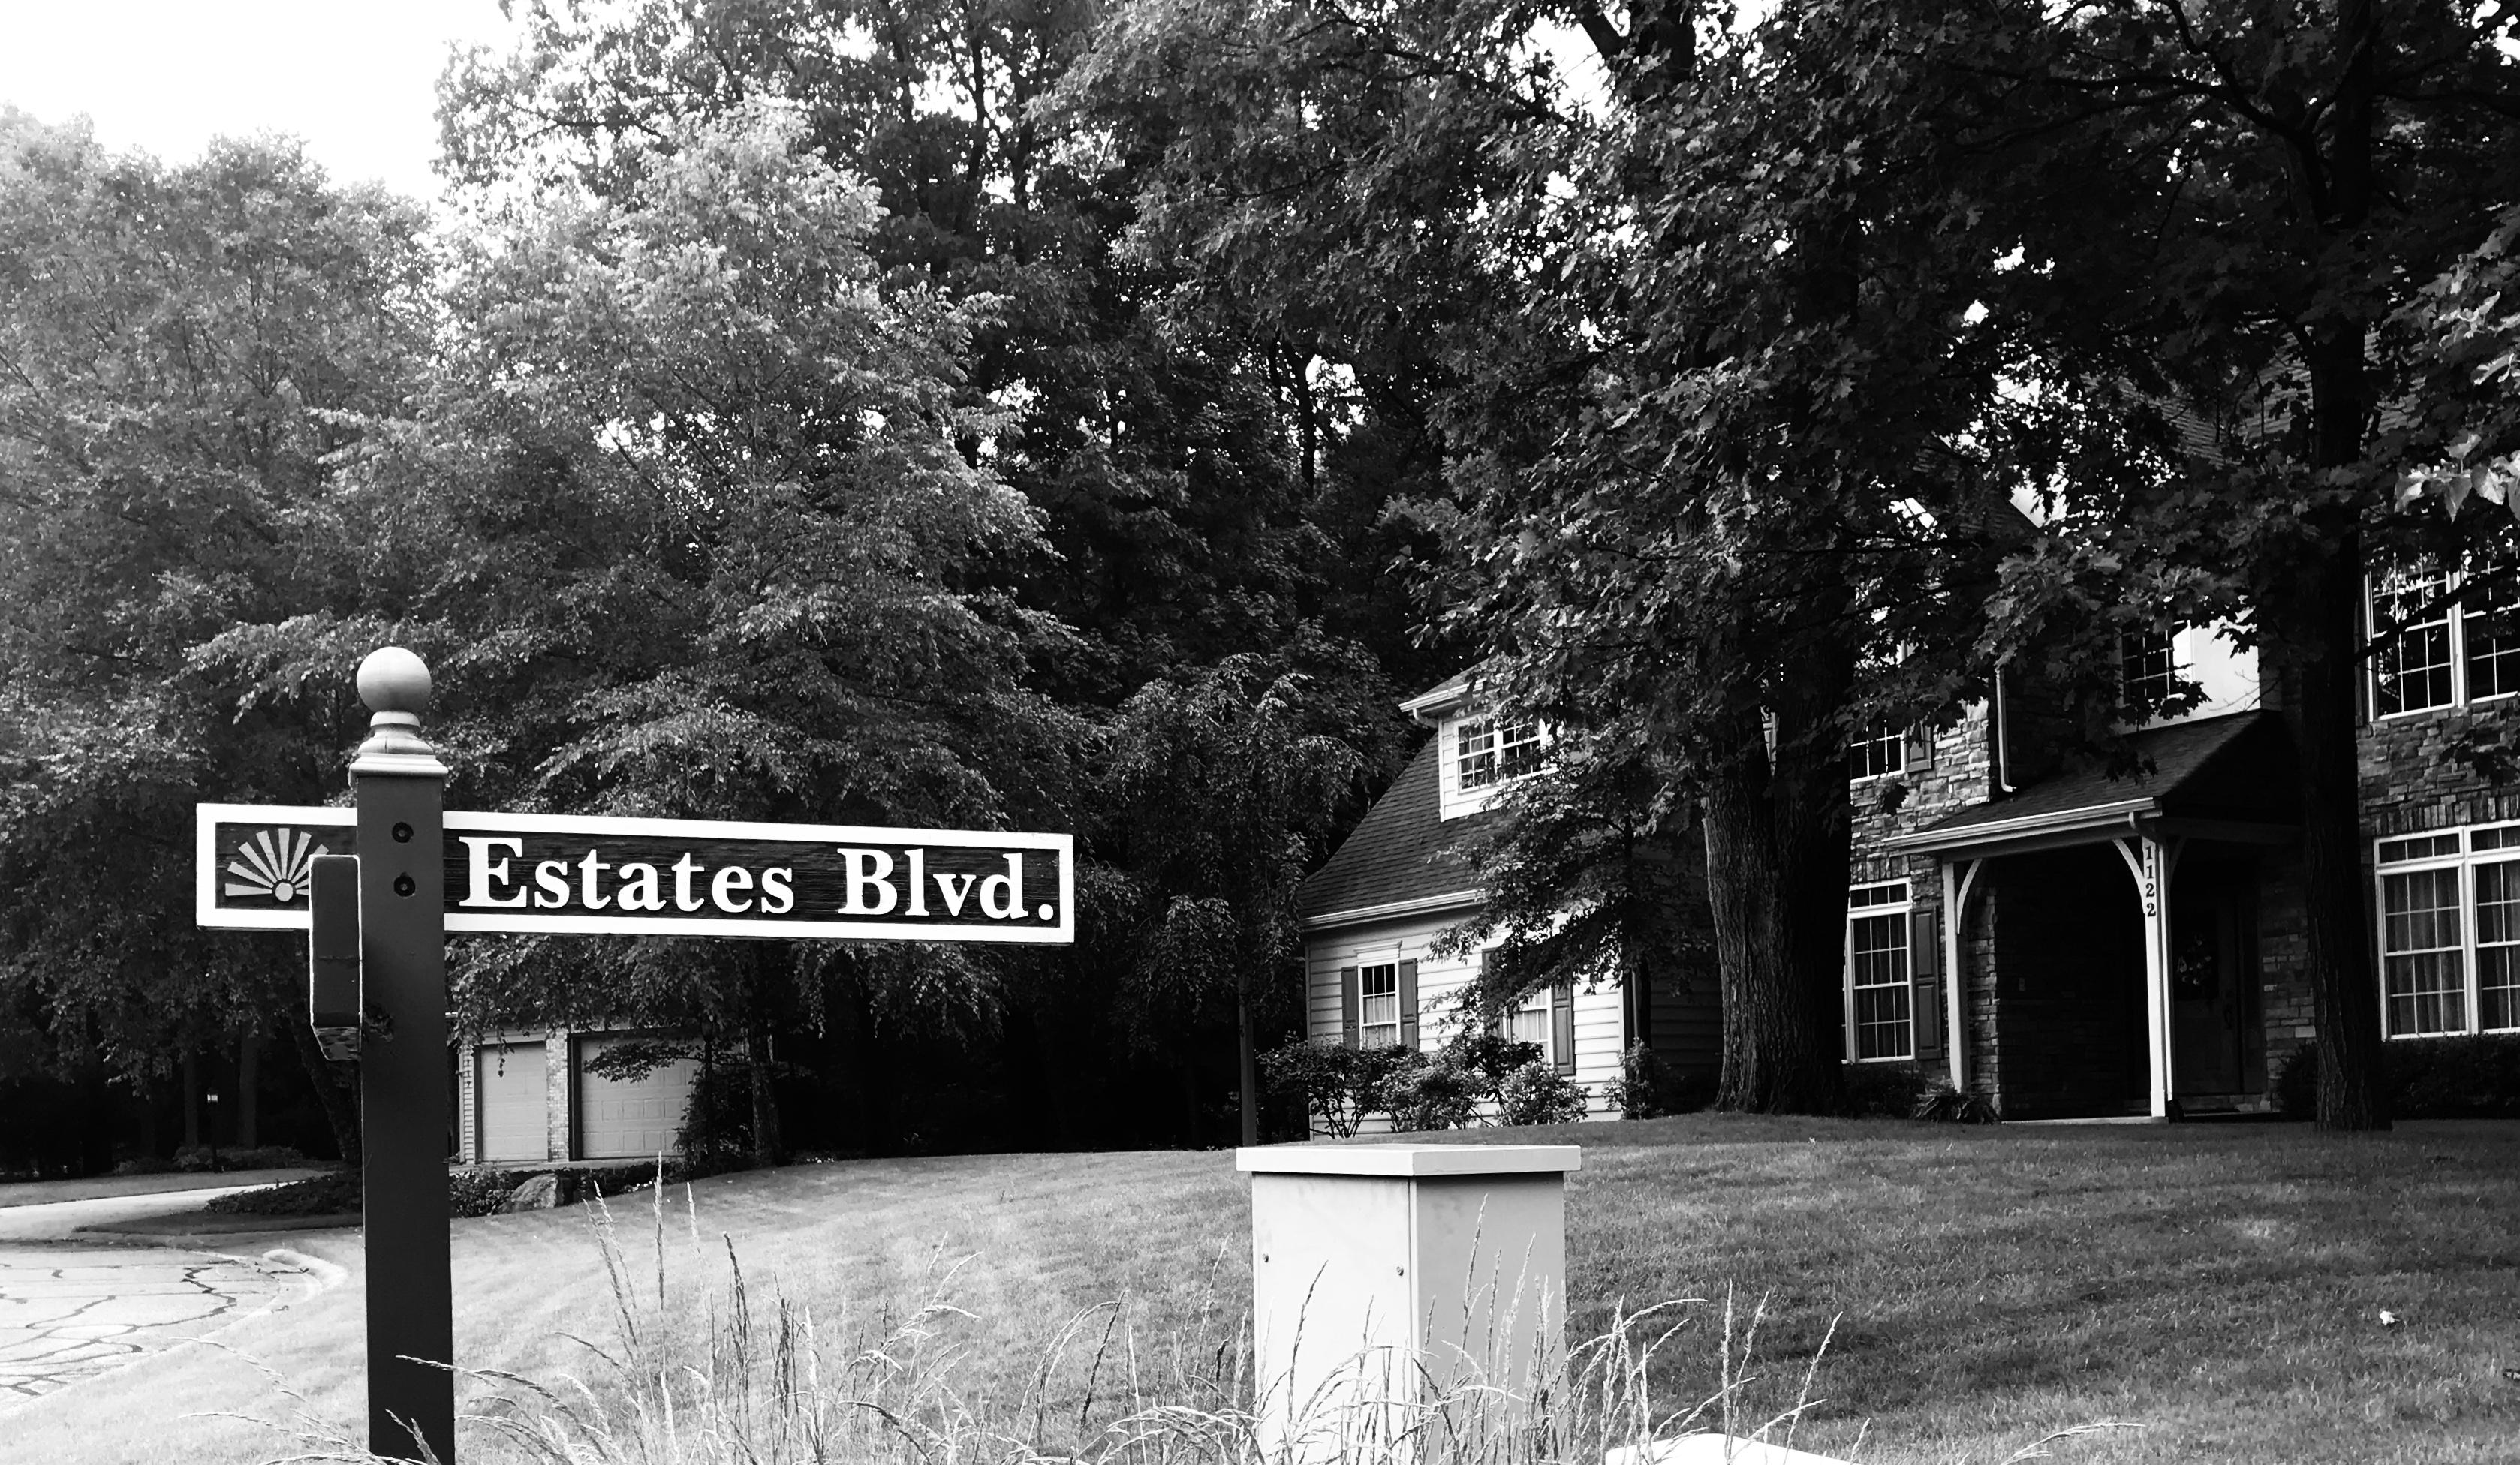 Estates Blvd. Street Sign